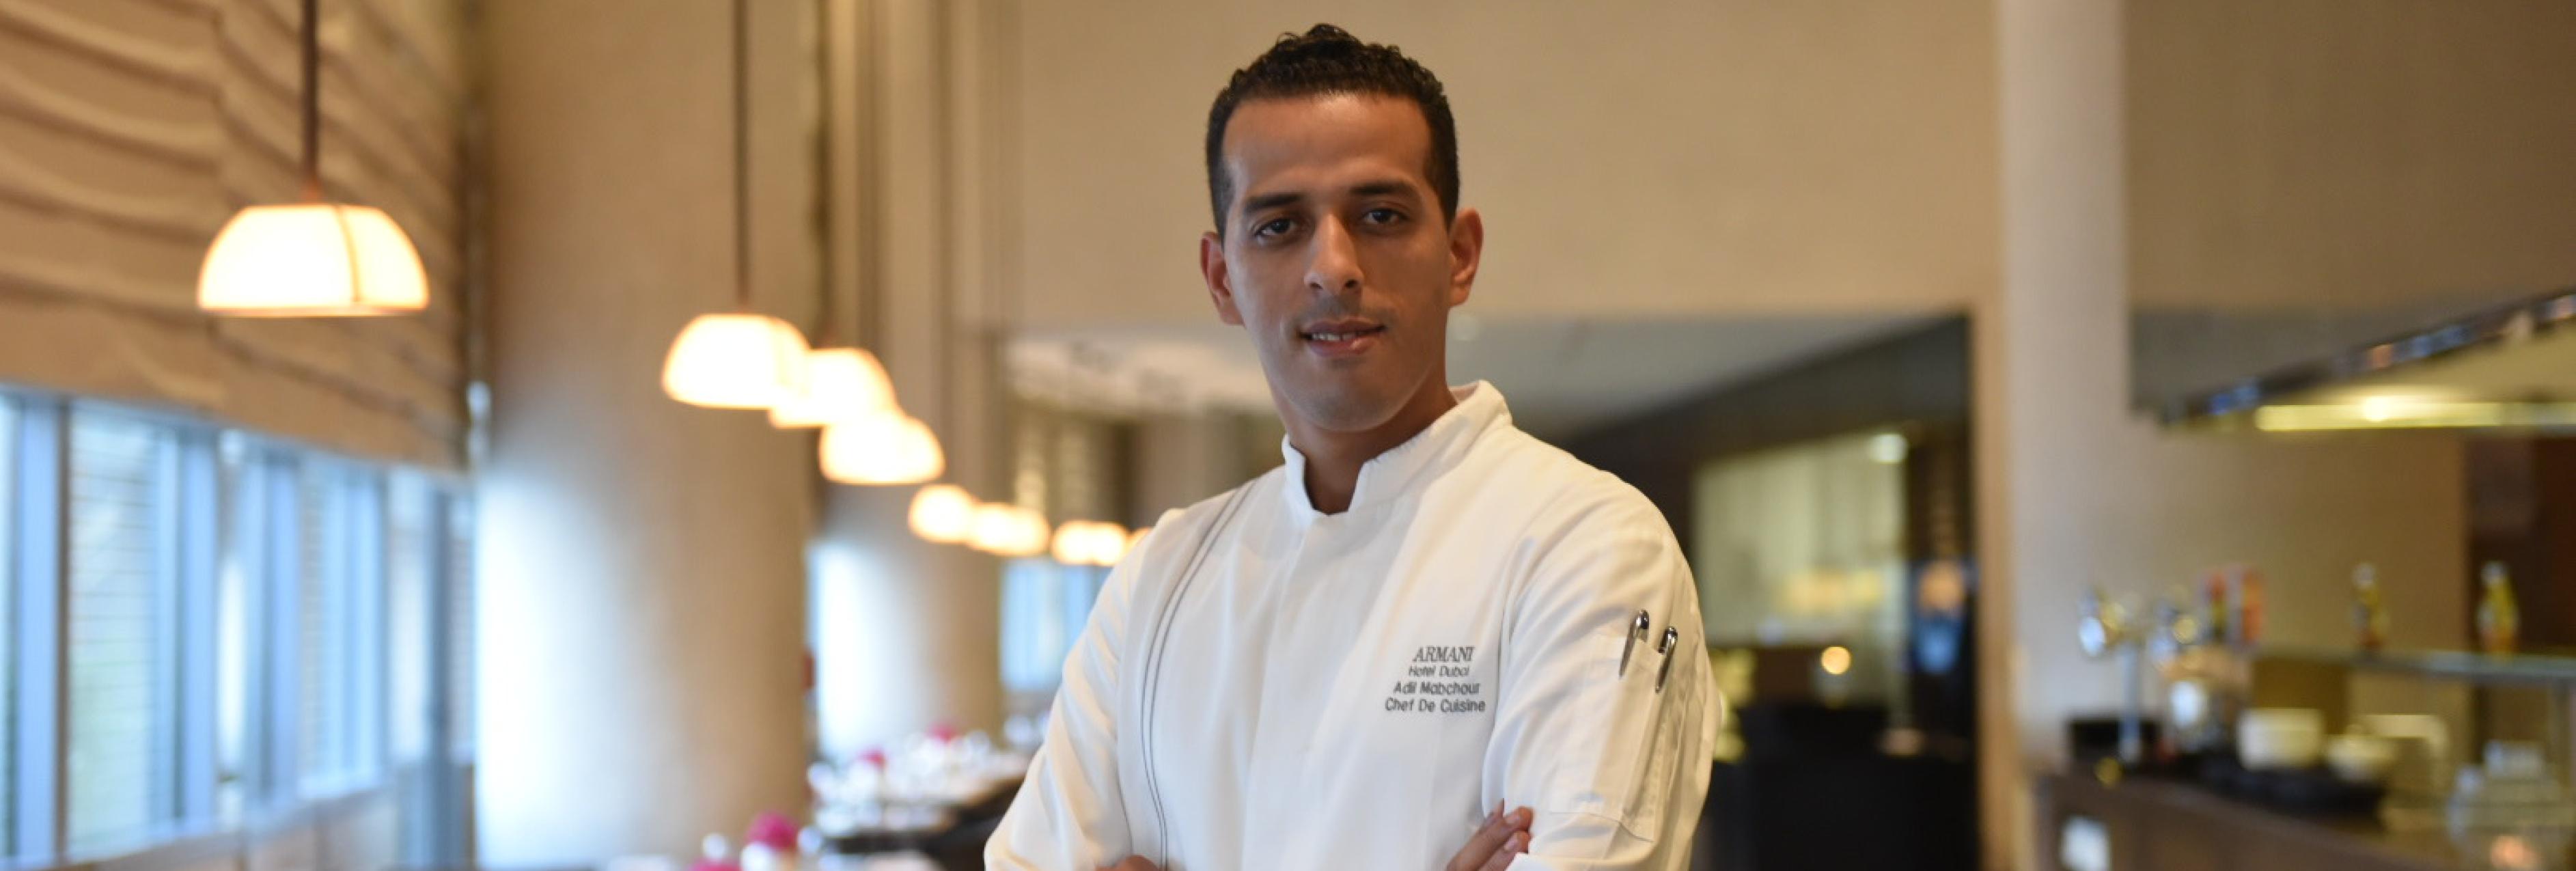 Adil Mabchour Chef de Cuisine at Armani Hotel Dubai